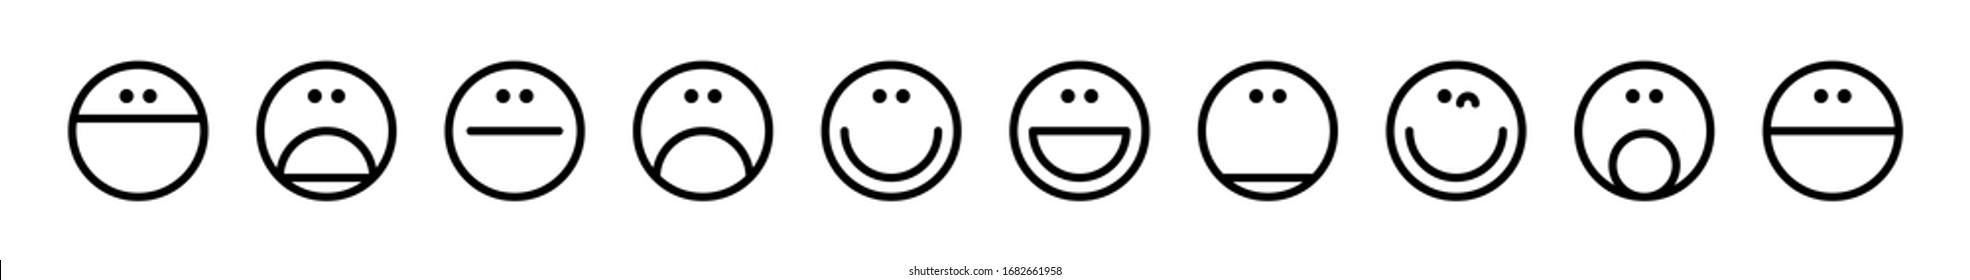 Emoticons set. Emoji faces collection. Emojis flat style. Happy and sad emoji. Isolated on white background. Vector illustration.